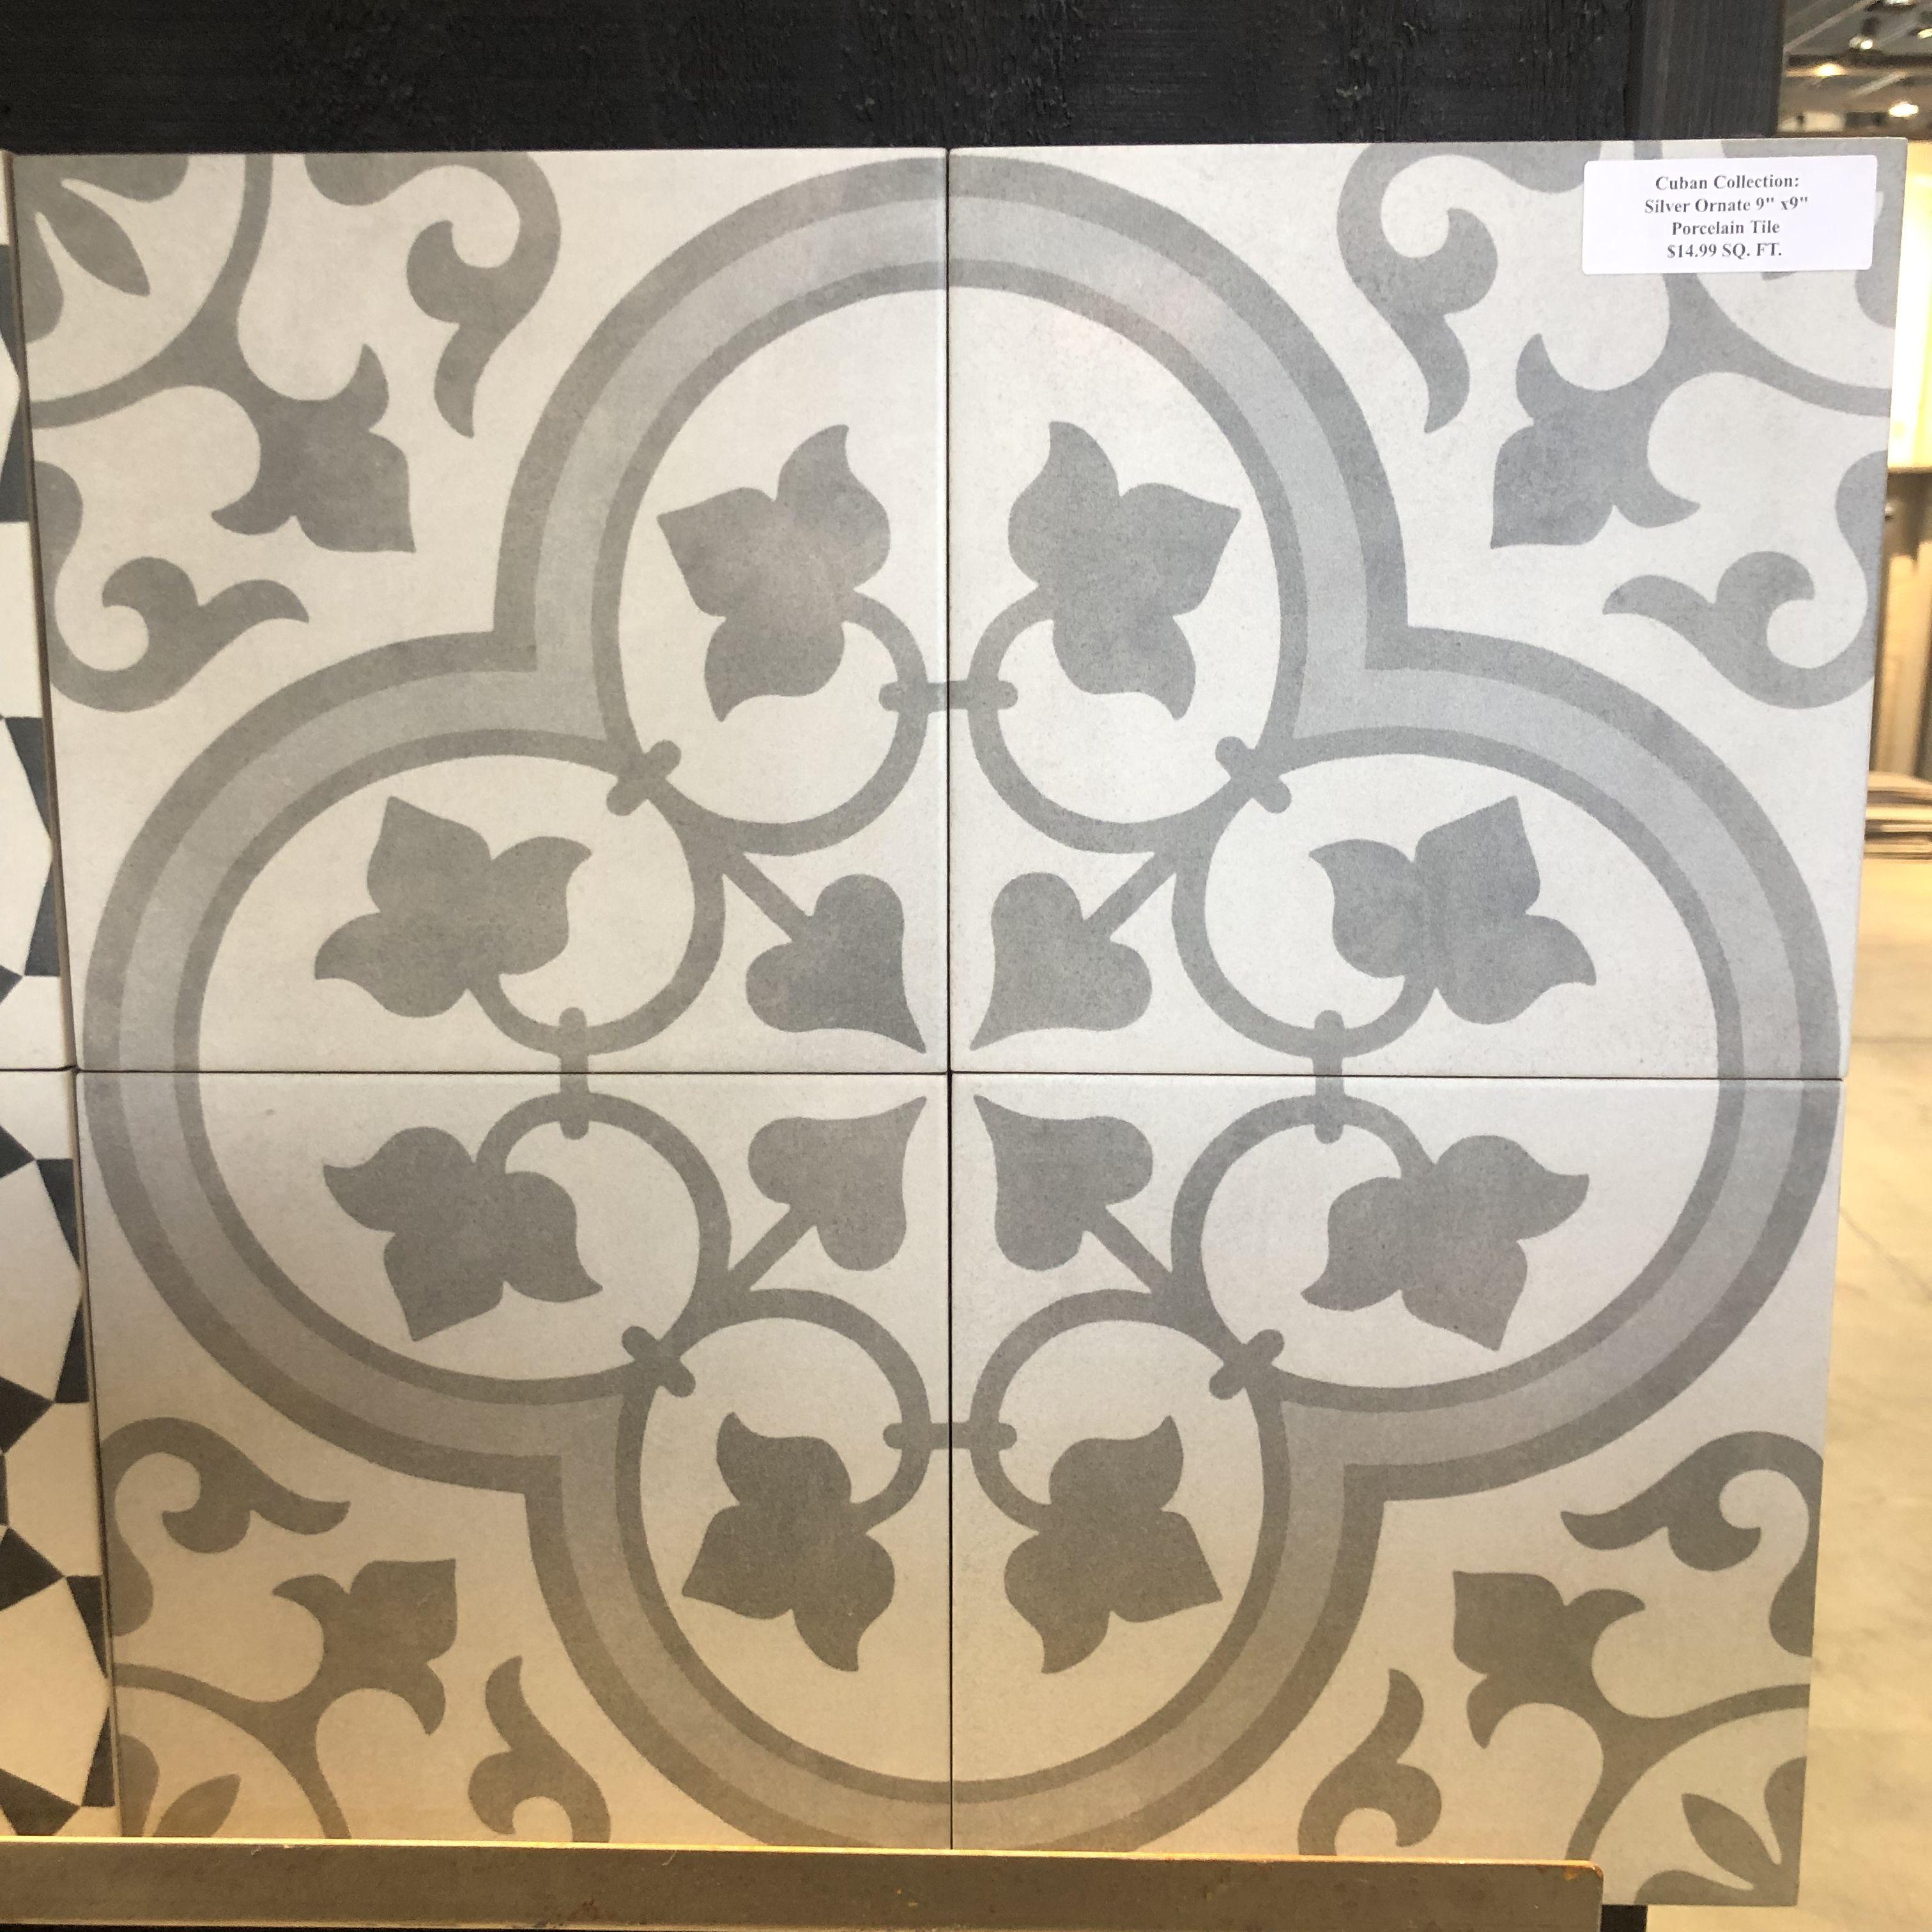 cuban silver ornate tiles ornate cuban tile tiles cuban silver ornate tiles ornate